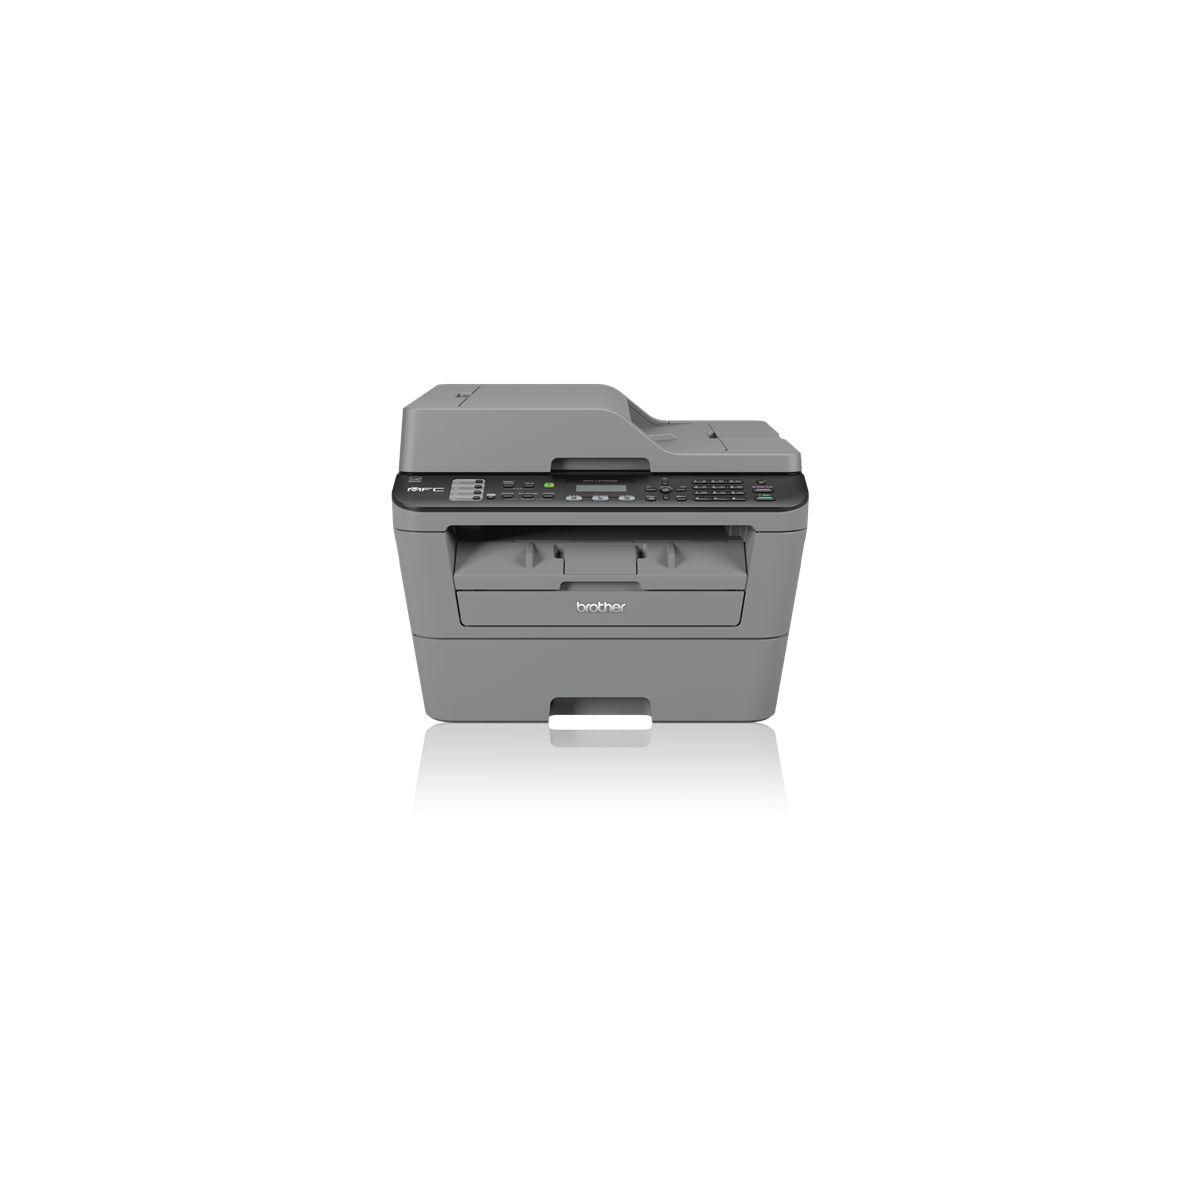 Imprimante multifonction laser monochrome BROTHER MFC-L2700DW (photo)